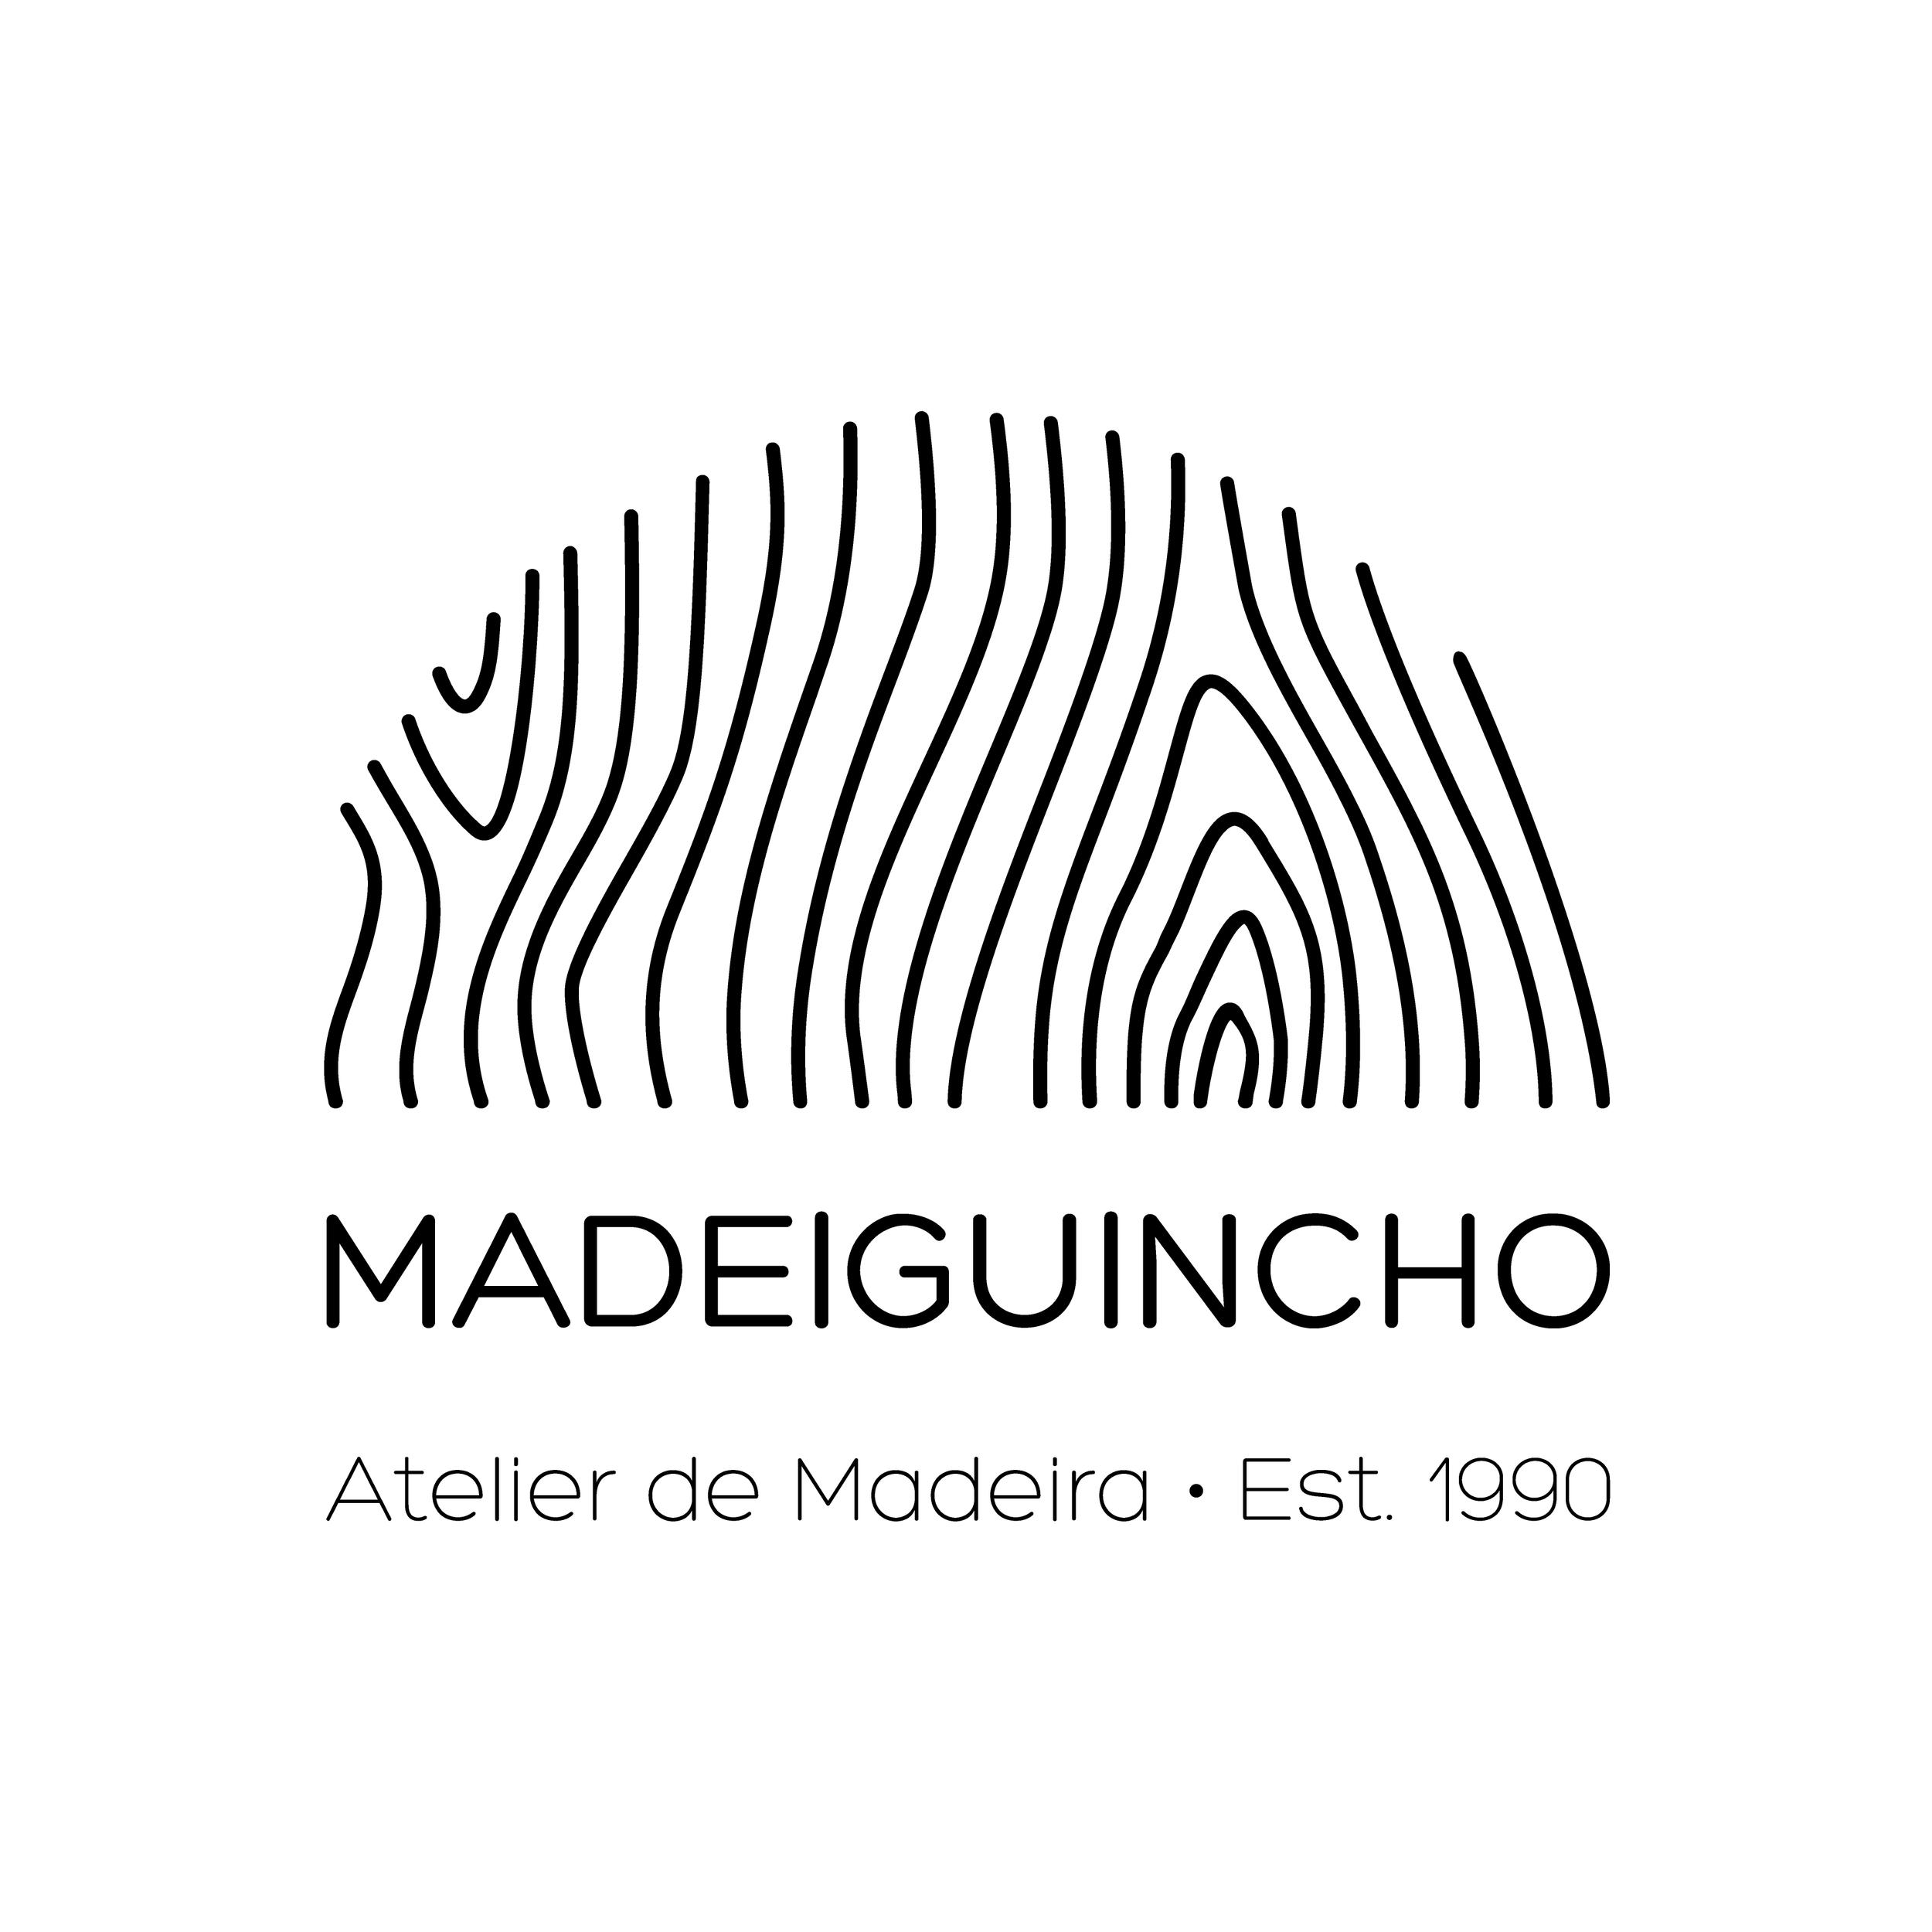 Arte-Final_Logotipo_MadeiGuincho-21.png